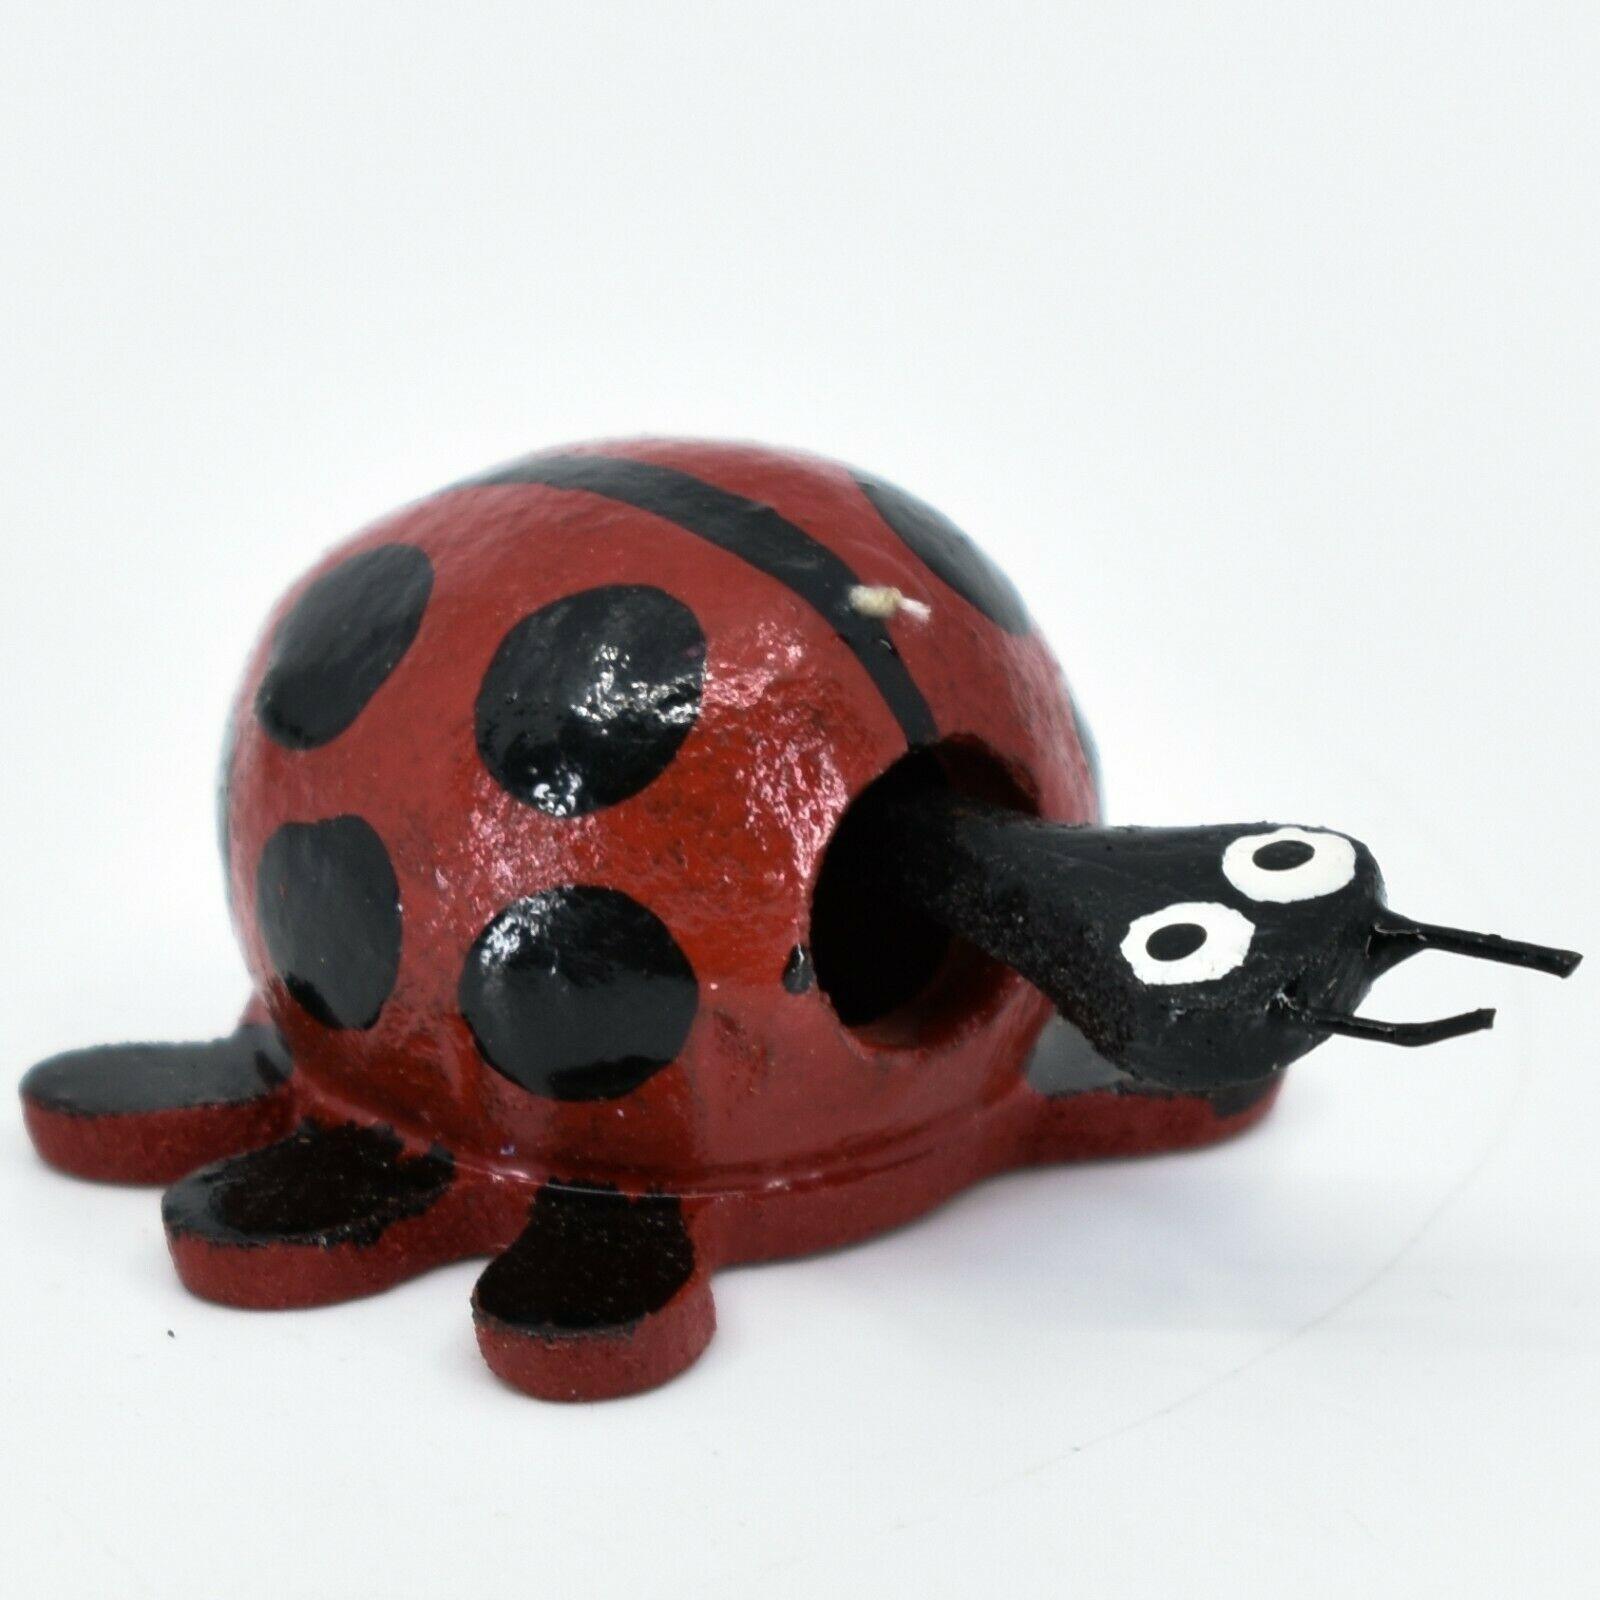 Handmade Oaxacan Wood Carving Folk Art Miniature Ladybug Bobble Head Figurine